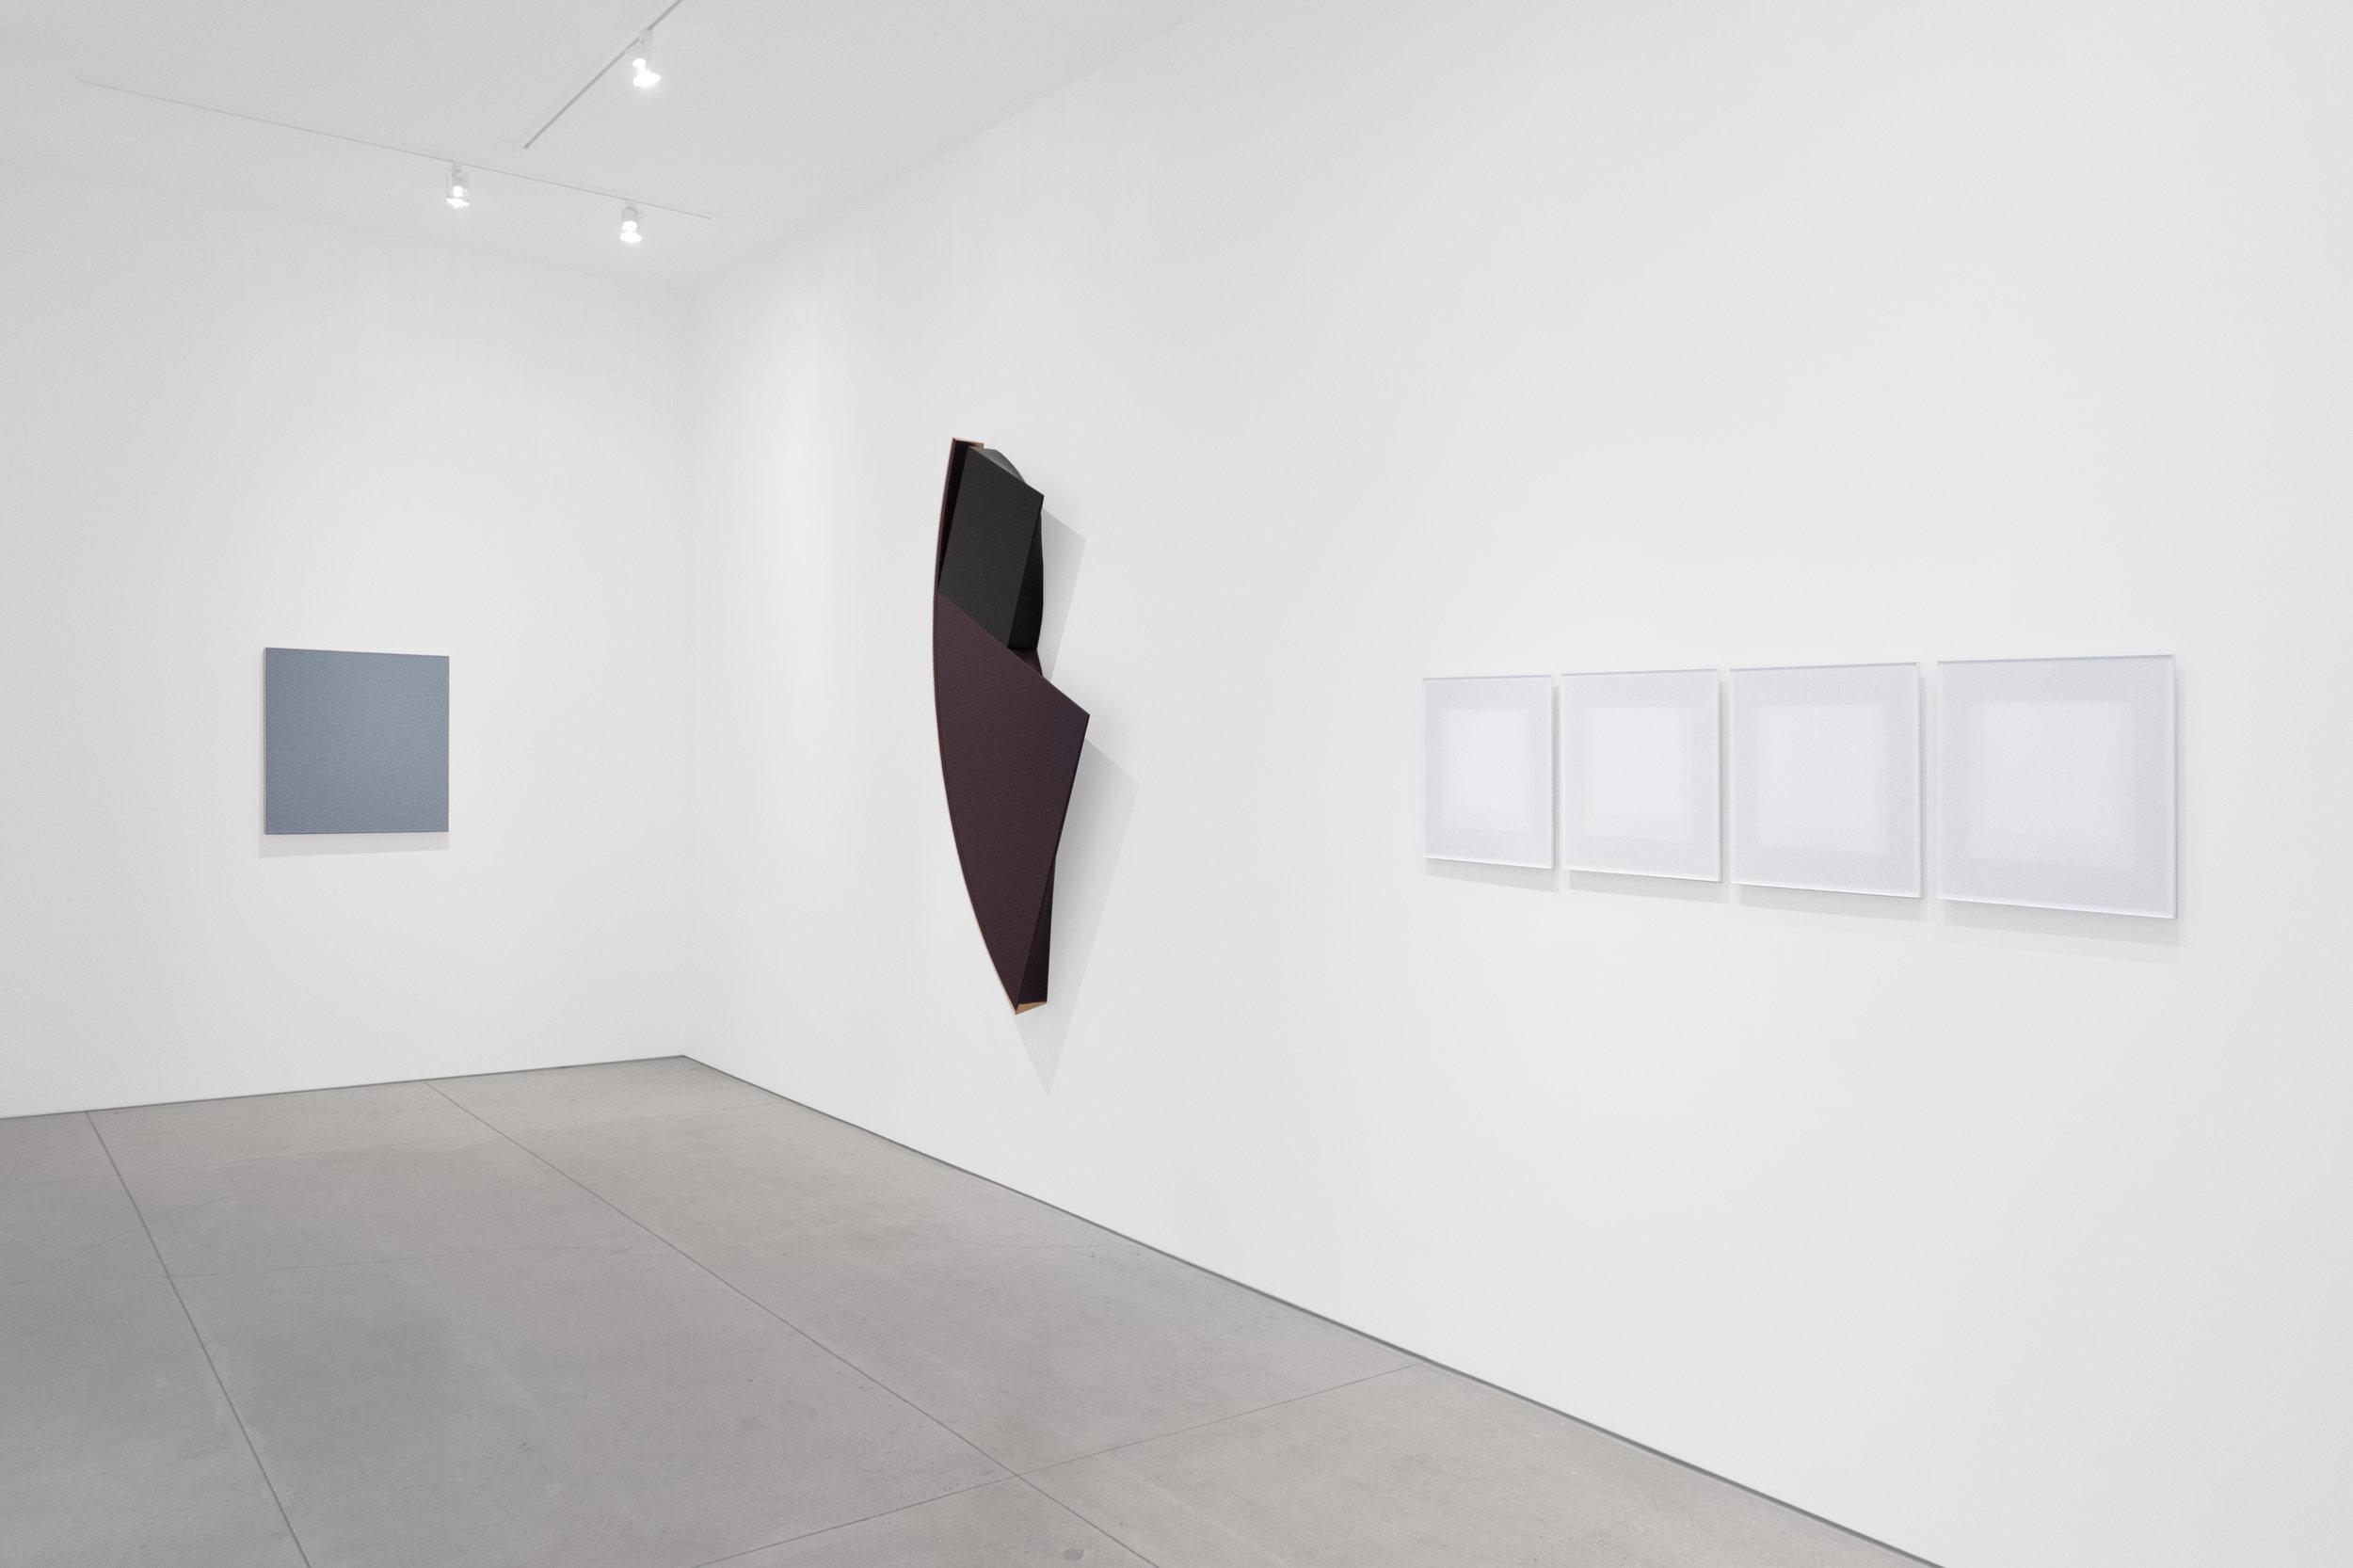 25 Years_Peter Blake Gallery_2019_Installation View_26.jpg